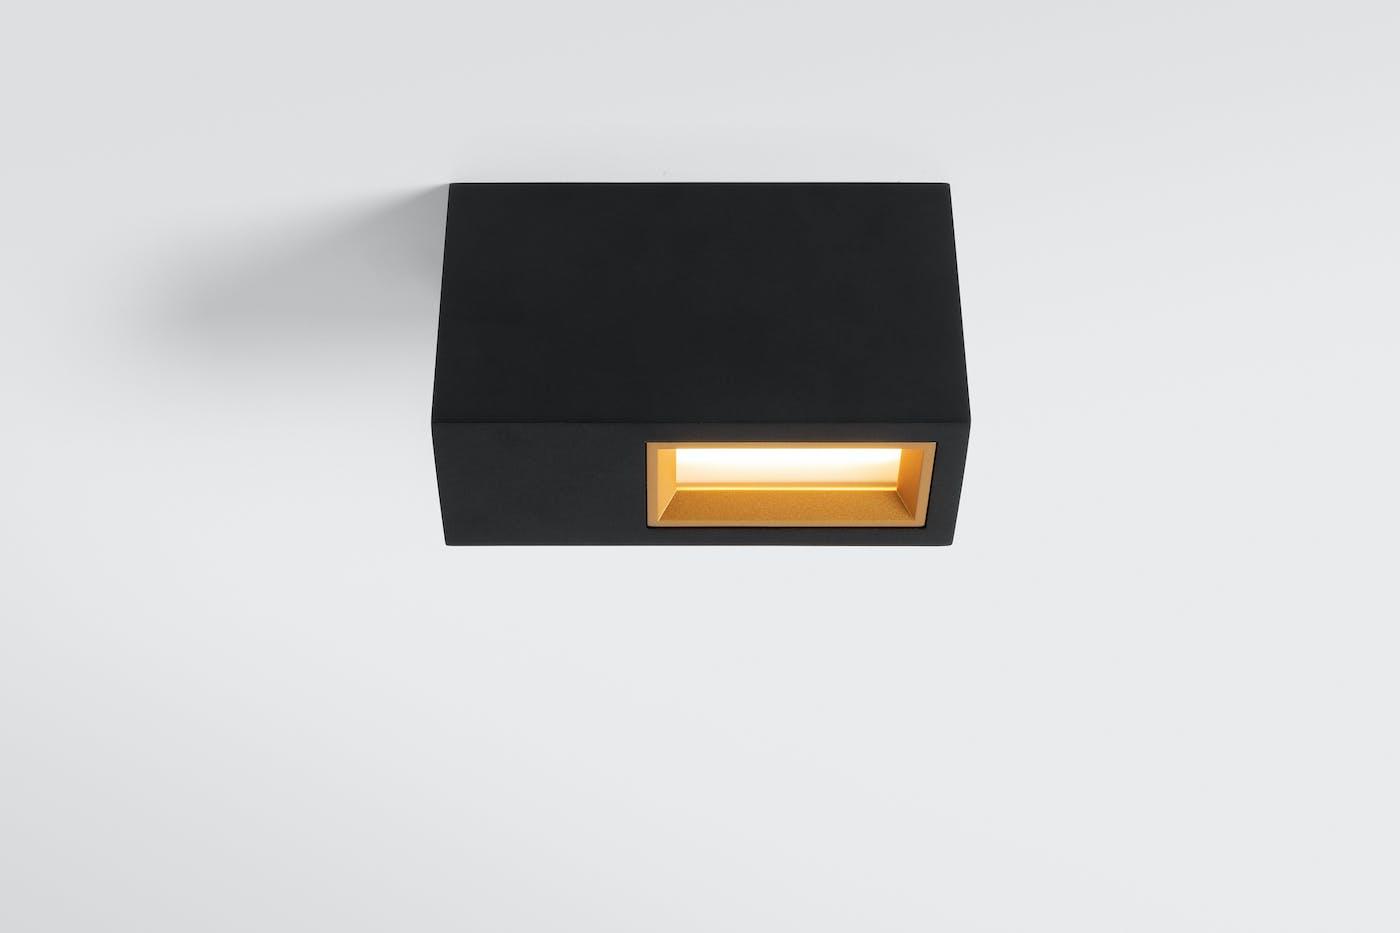 QBINI SURFACE BOX GI 2 X BLSTR QBINI GENERAL GOLD 02